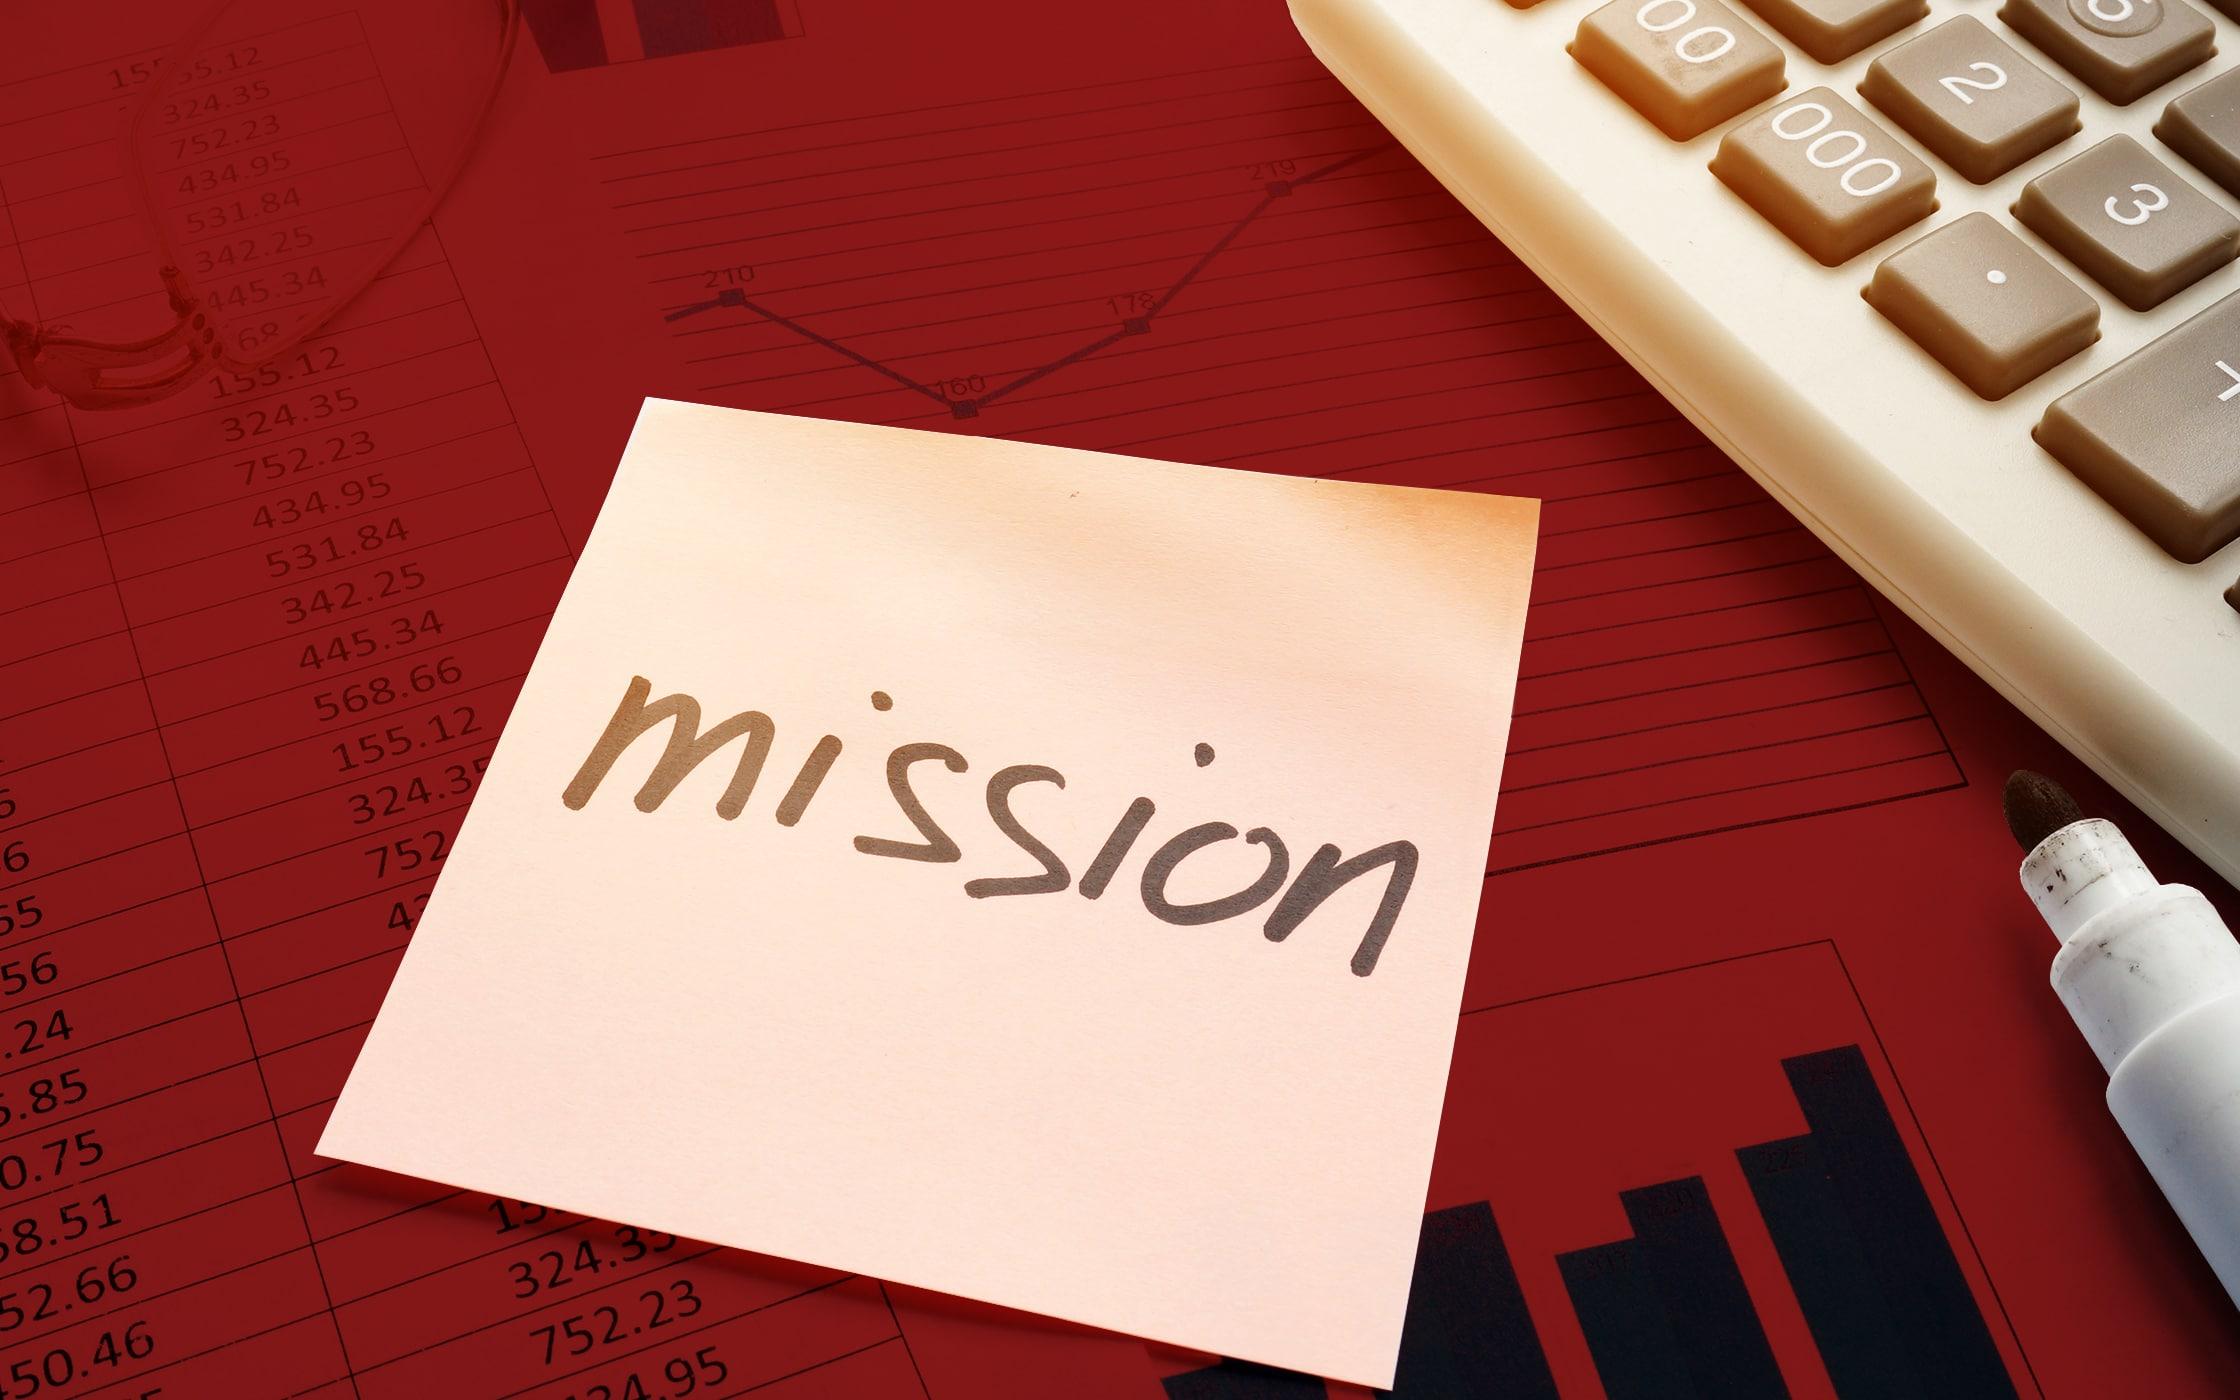 Company Mission Statement